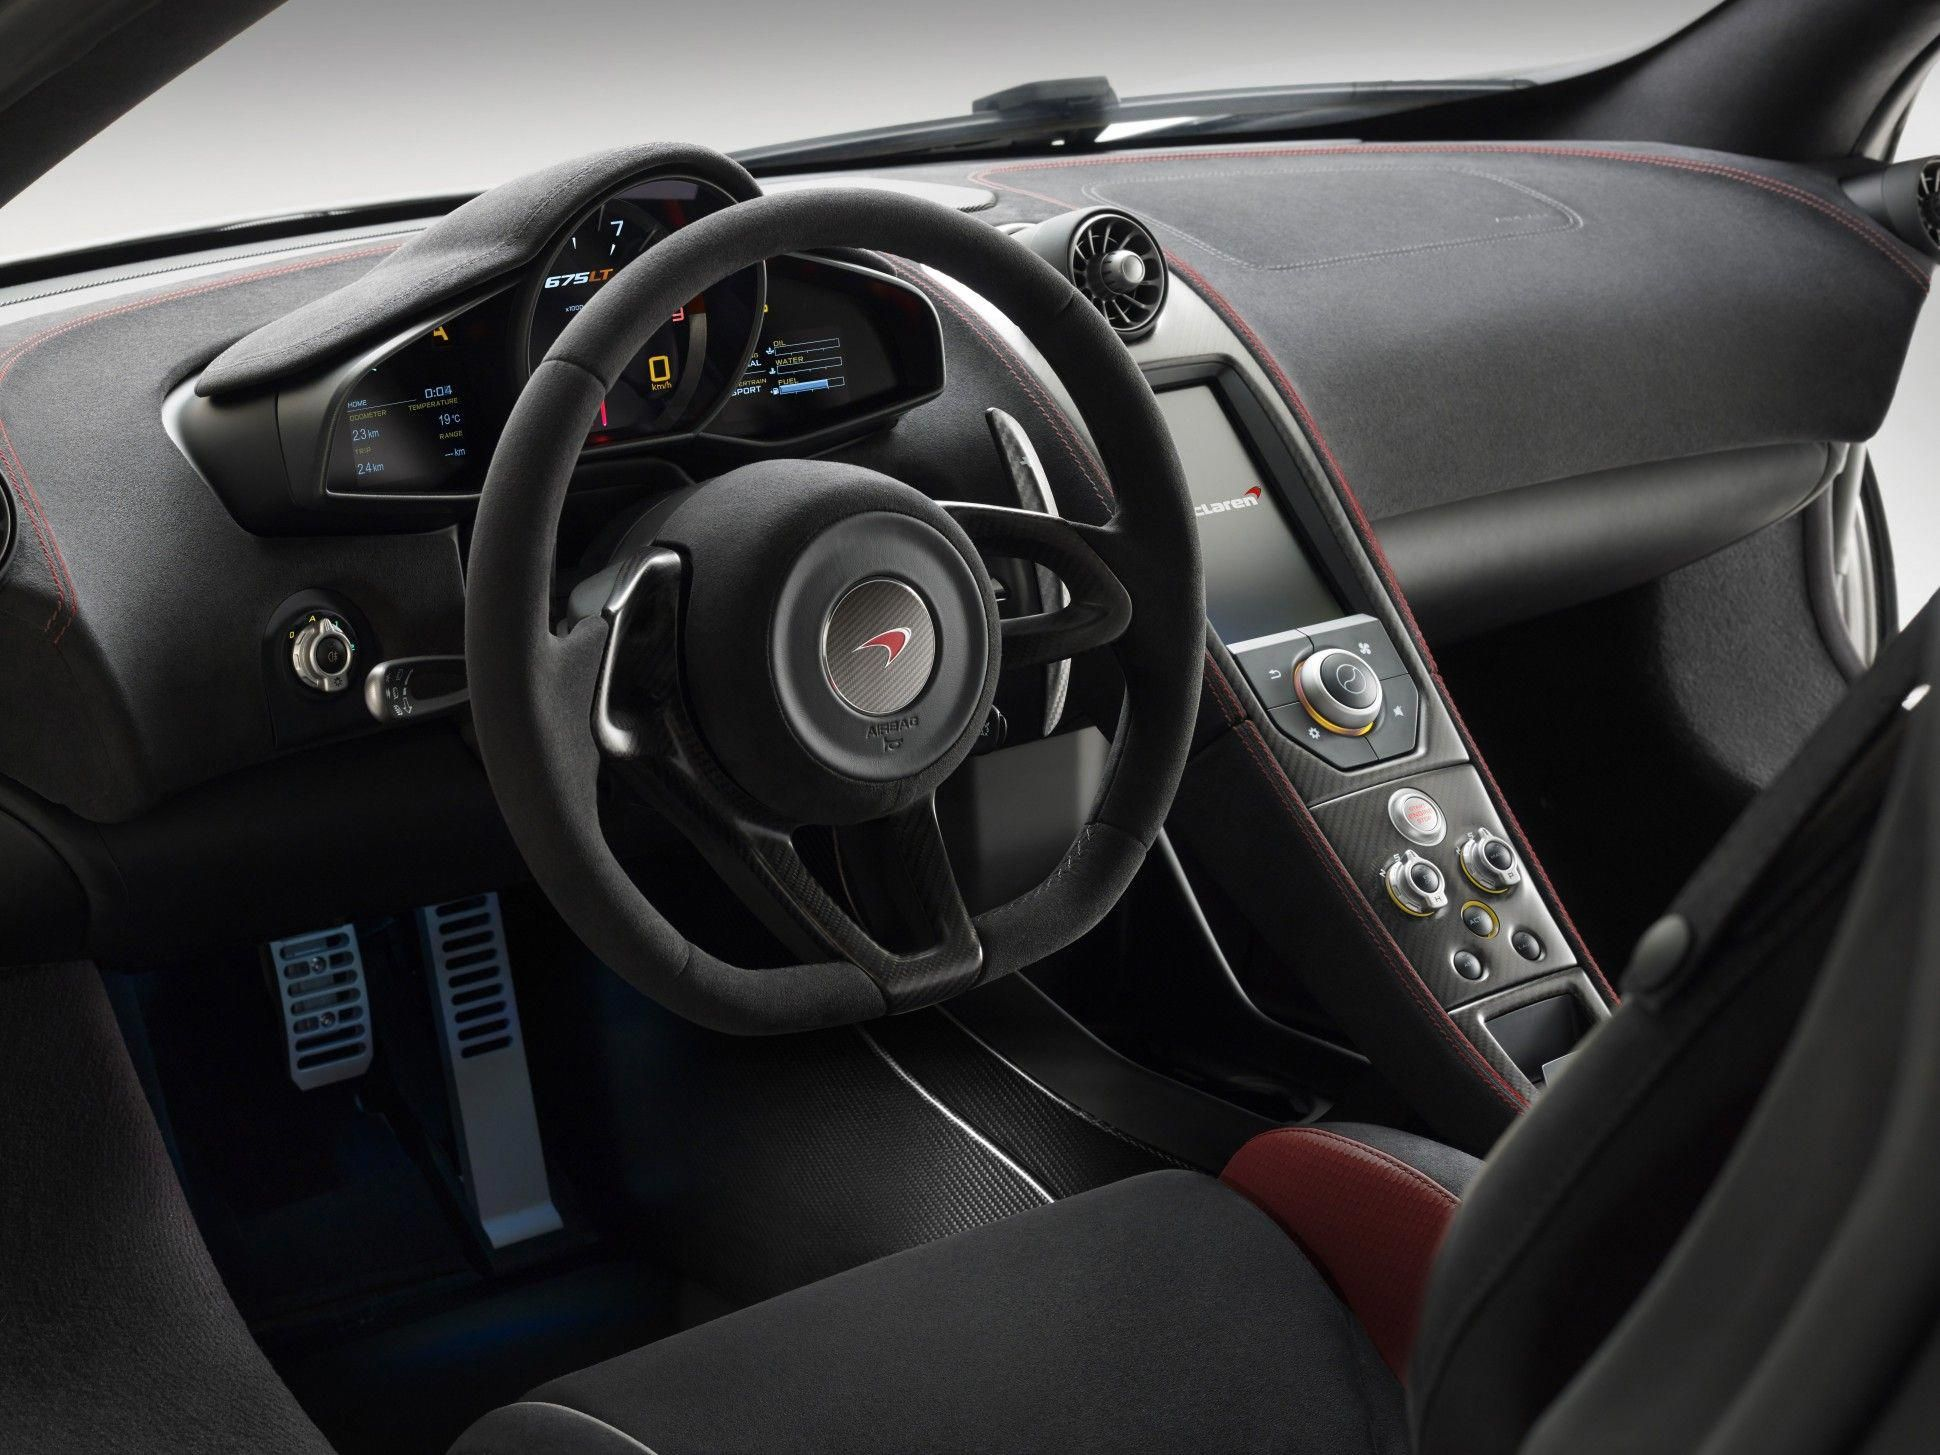 Inside Carbon Fiber Shelled Seats Modeled After Those Of The Mclaren P1 Are Upholstered In Alcantara Mclarenp1